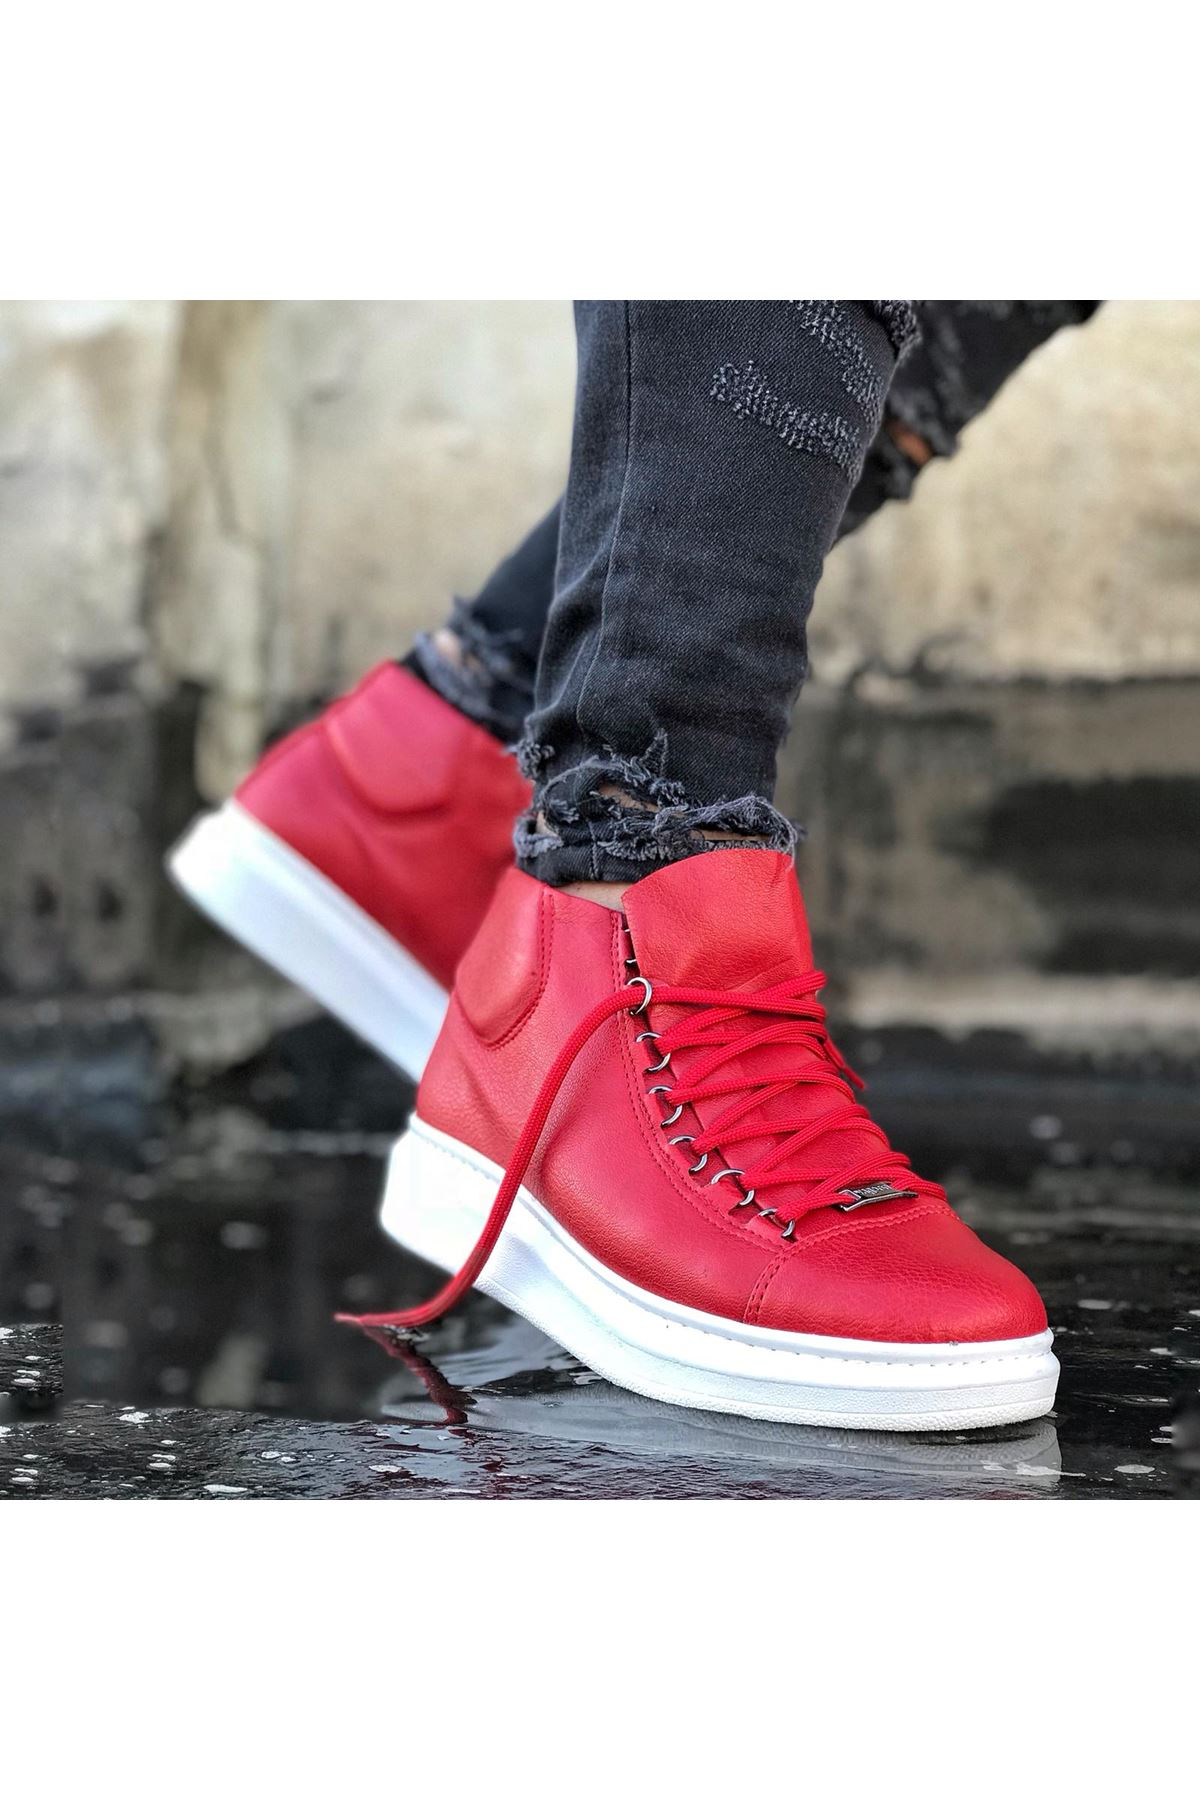 Wagoon WG032 Kırmızı Bağcıklı Sneakers  Yarım Bilek Bot